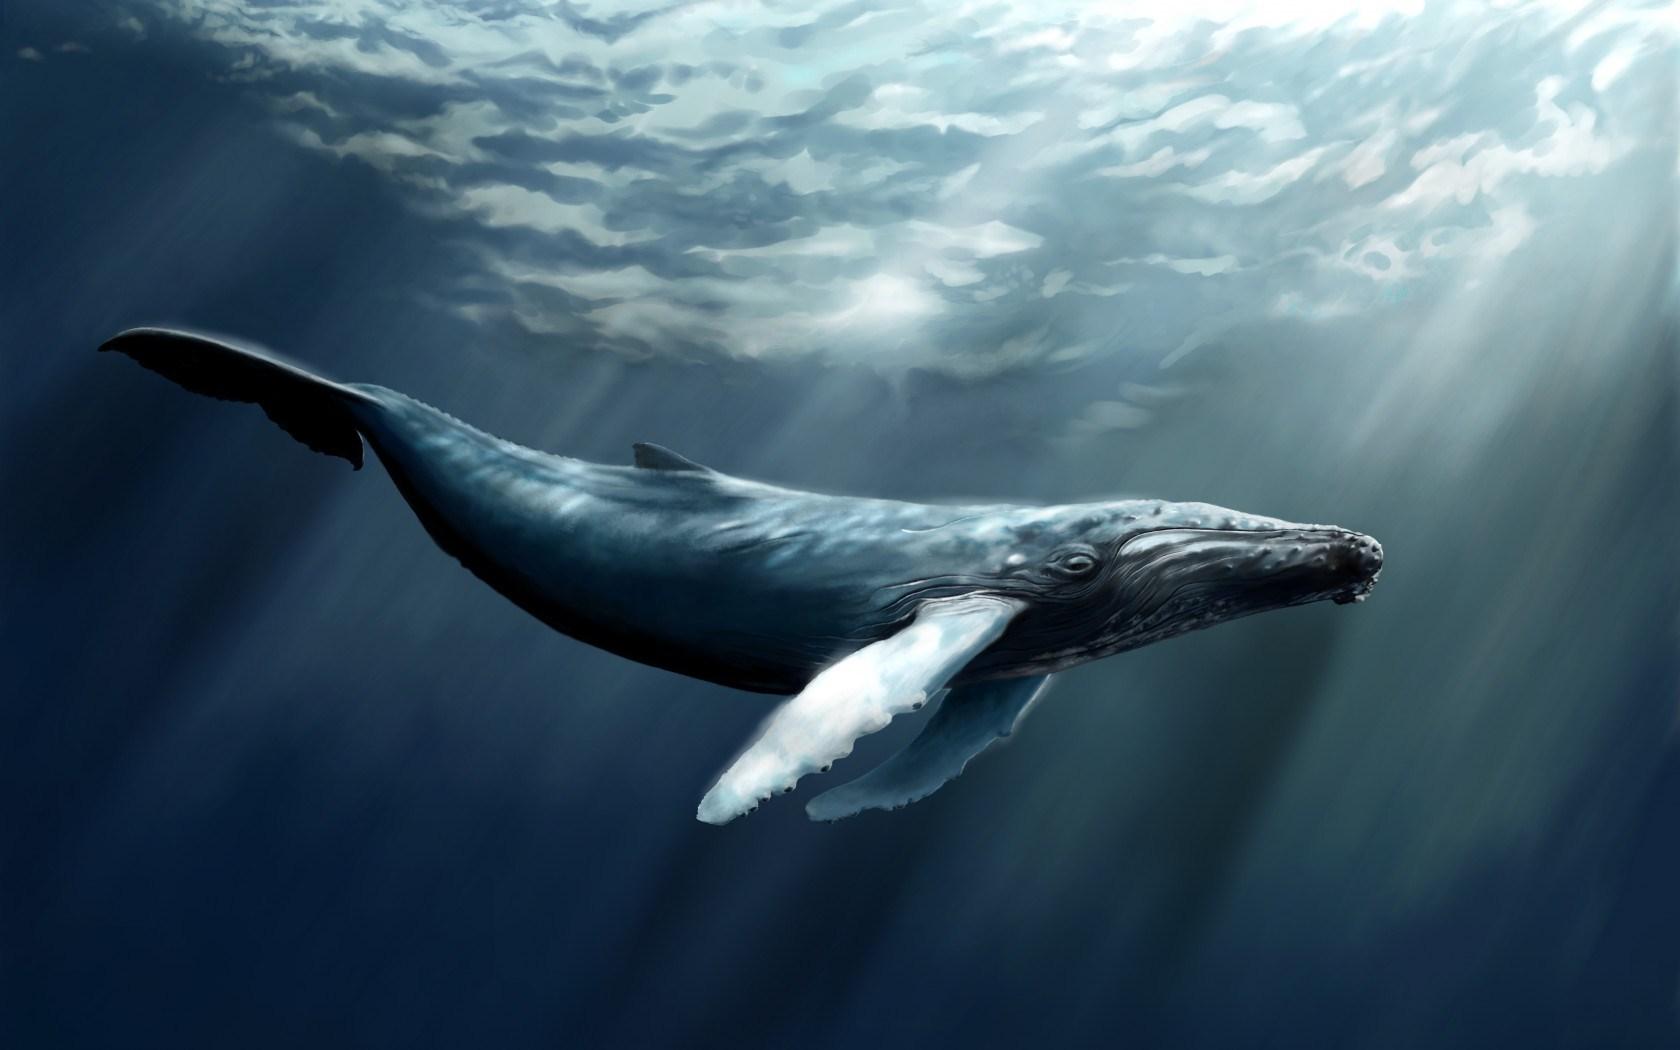 Water Whale Art 1680x1050